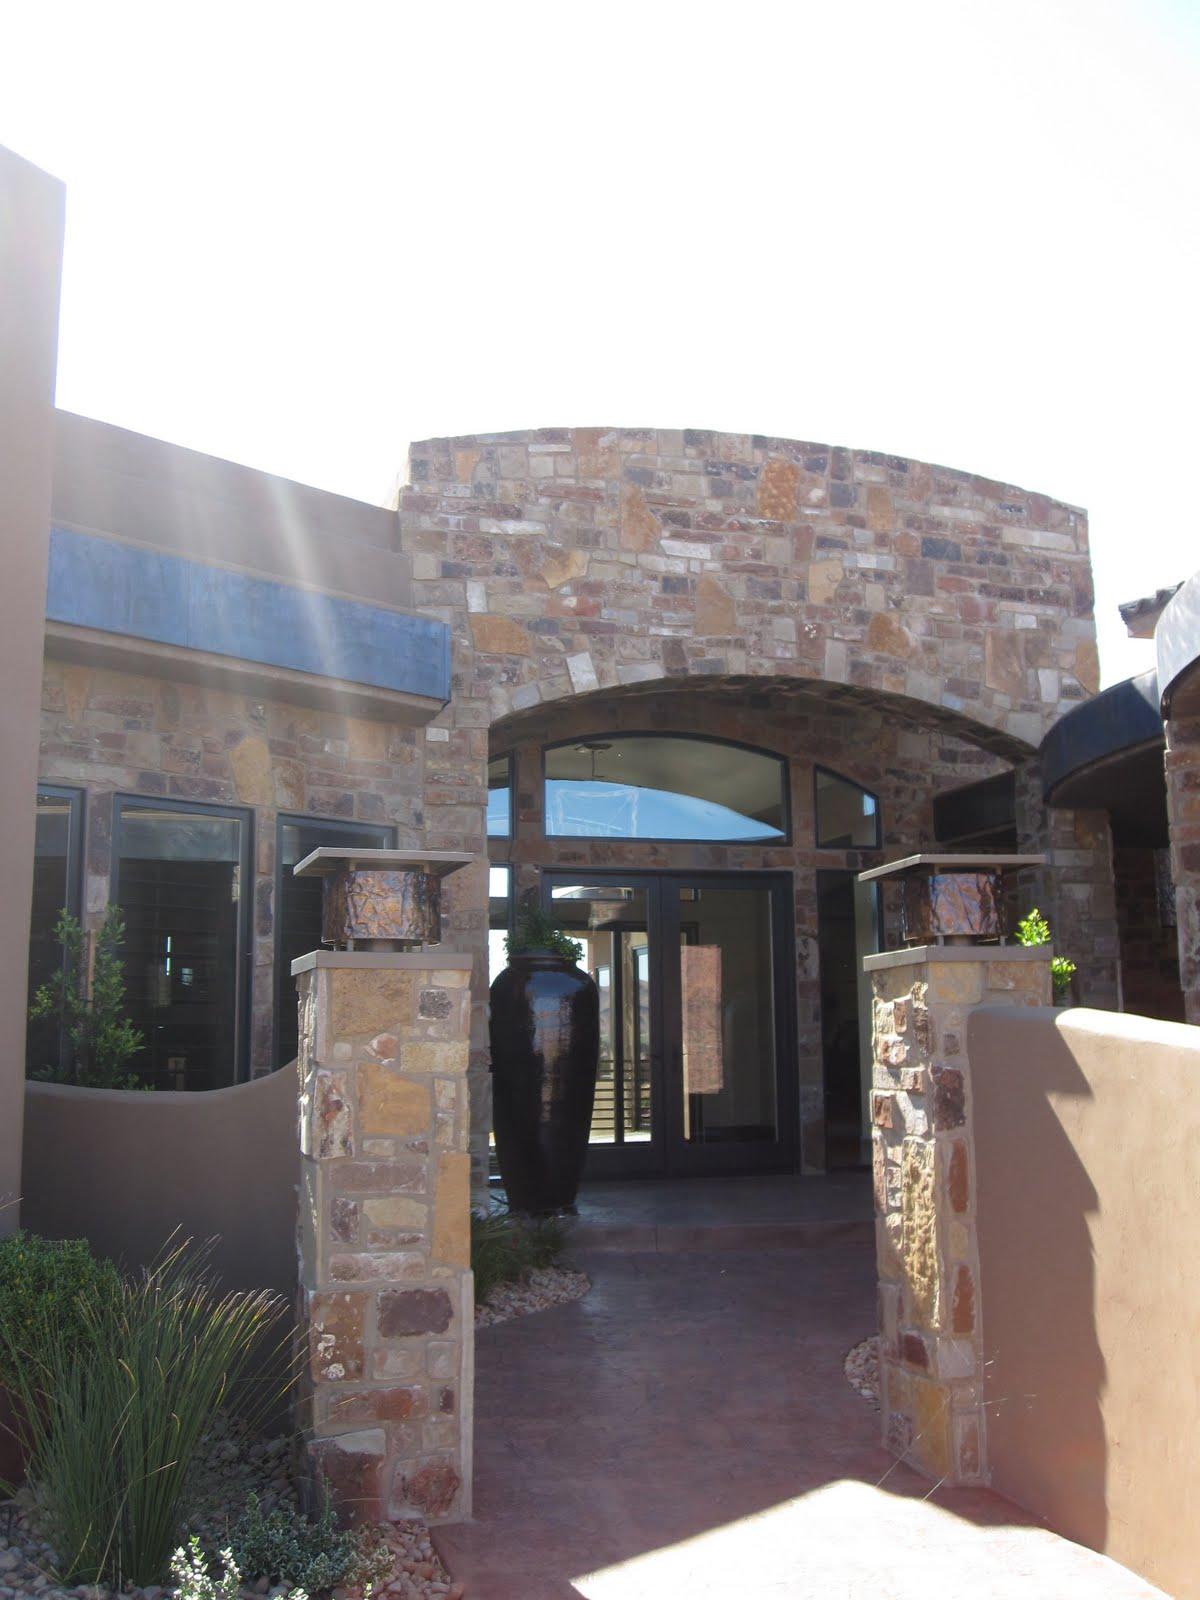 1600 #936738 BIG TIME House Lover : Garage Doors And Gates  St. George Utah pic Garage Doors Utah 36711200